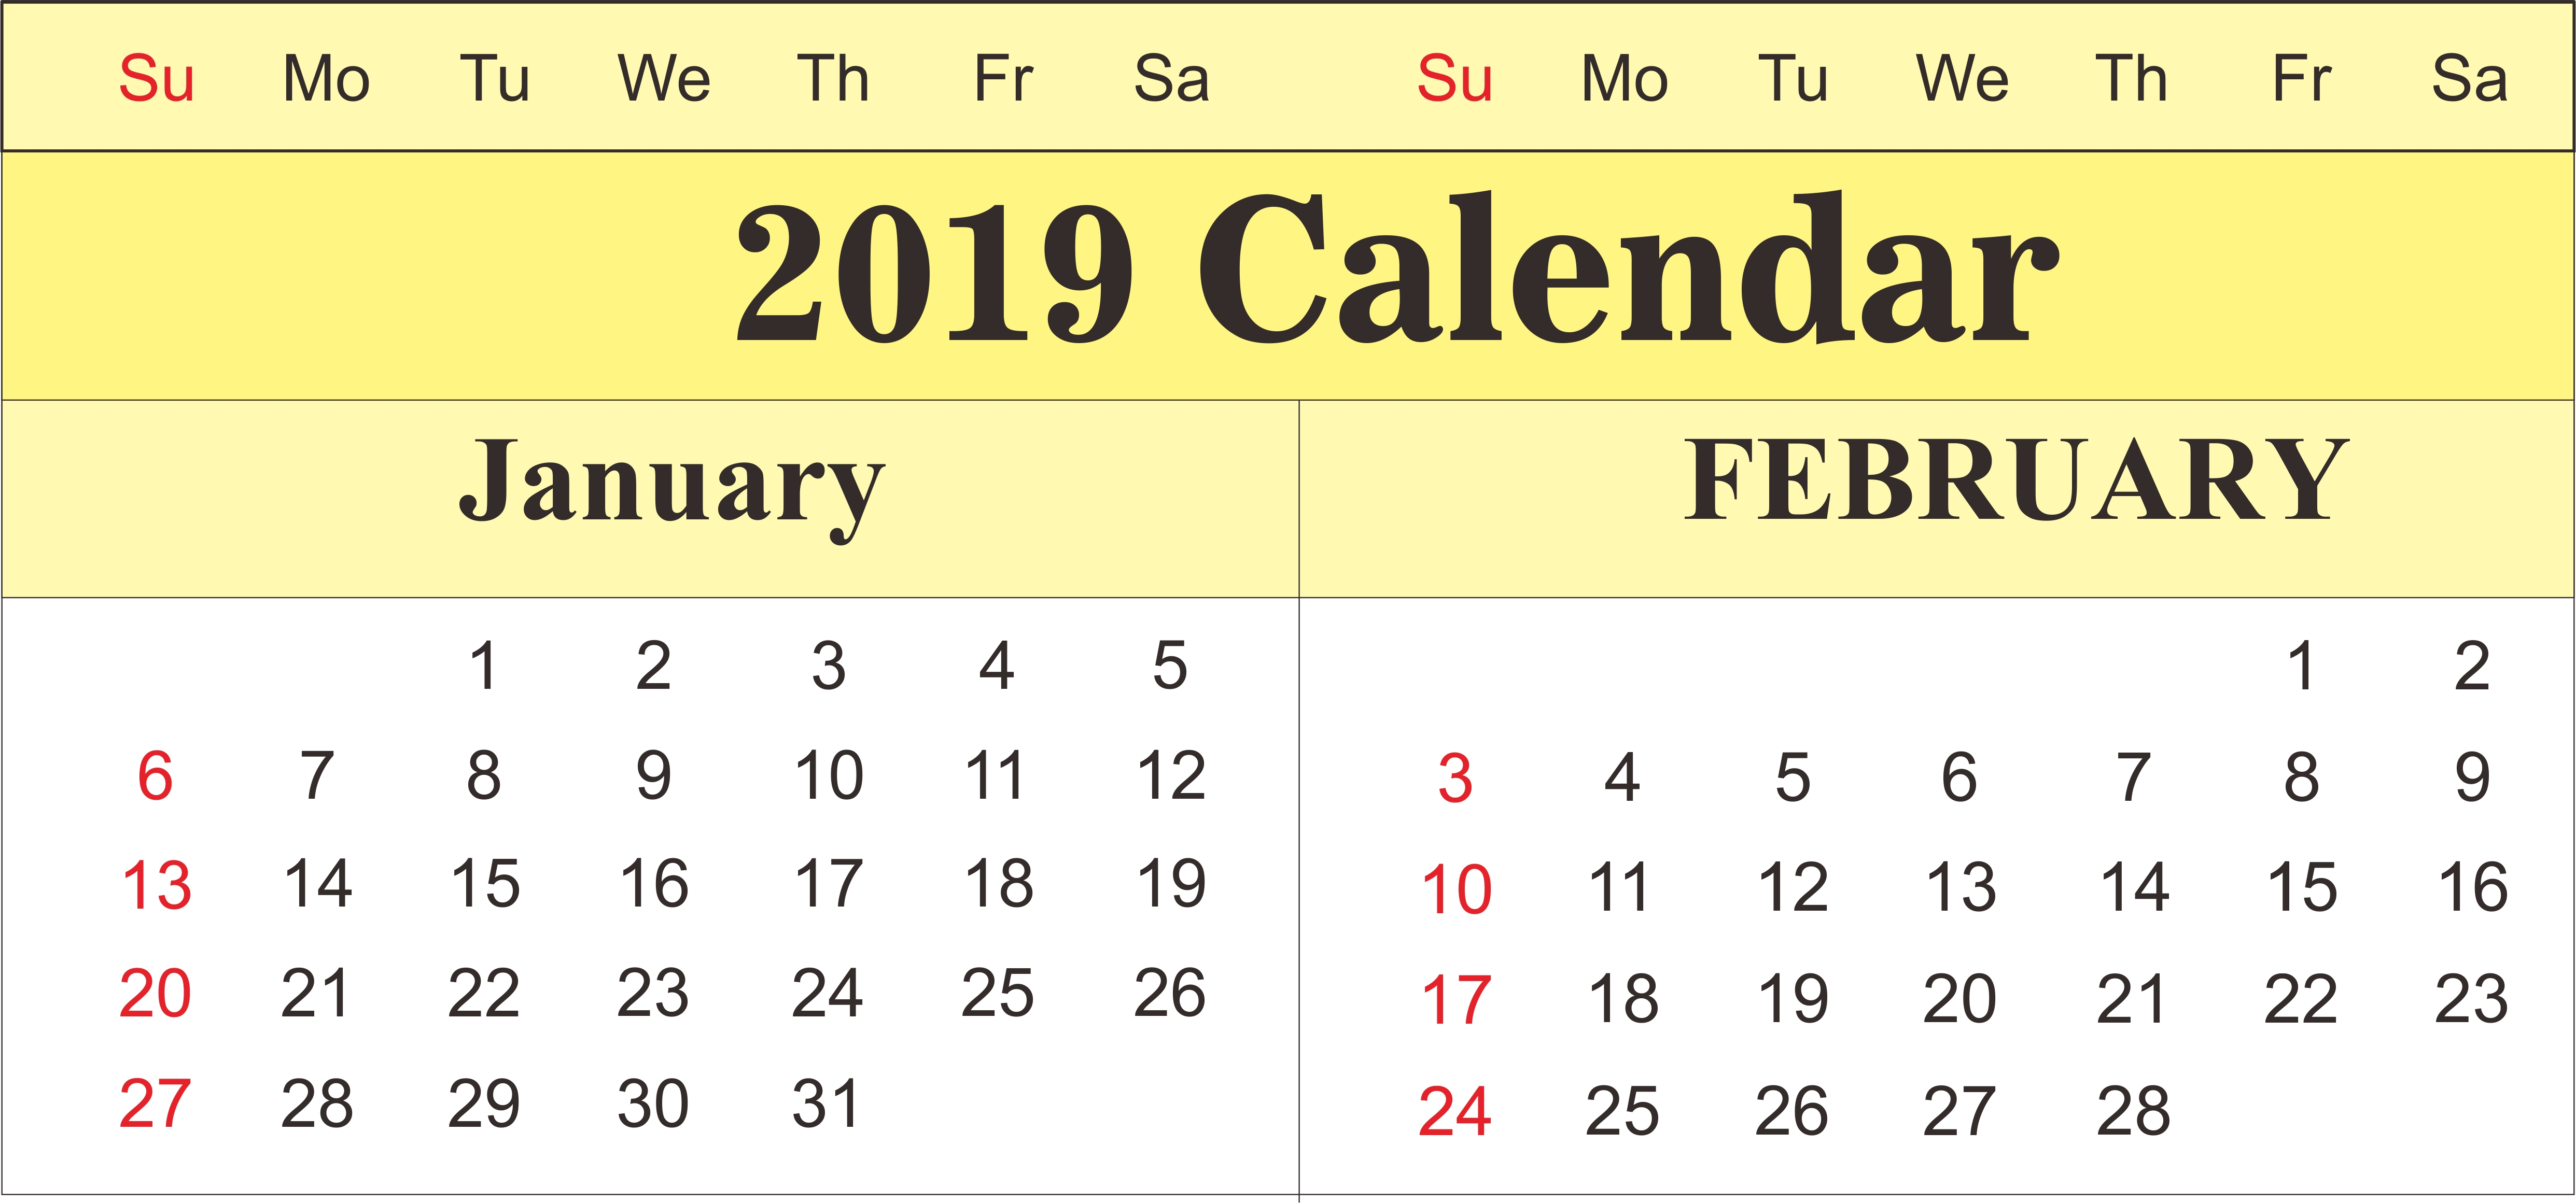 Printable January And February 2019 Calendar | 250+ February 2019 Feb 9 2019 Calendar